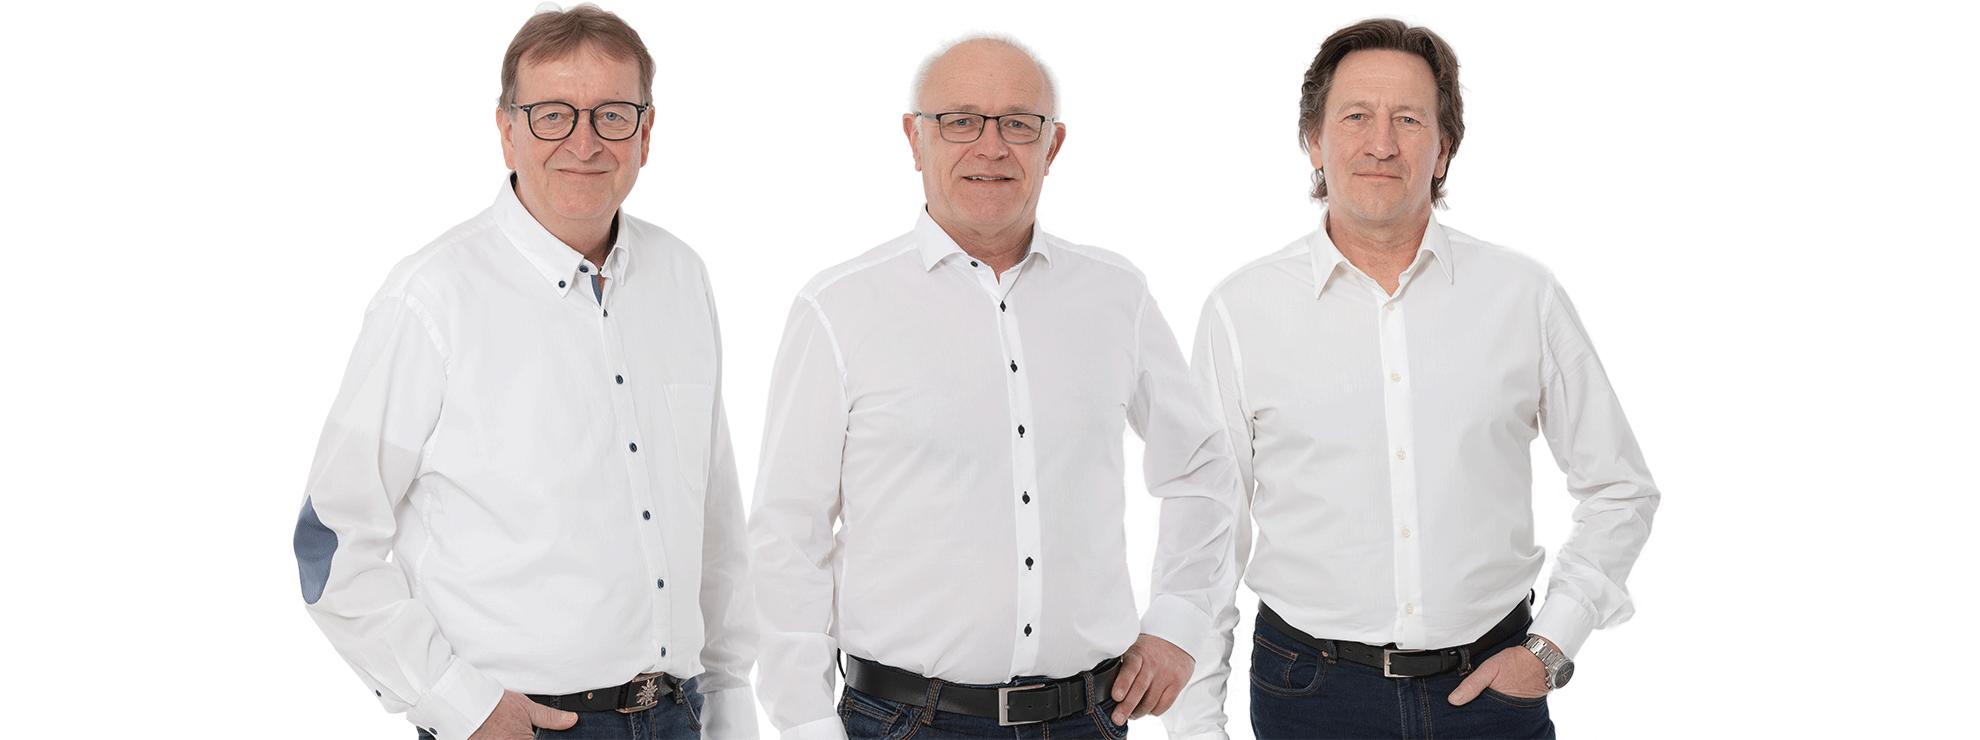 Dieter Luhmann, Thomas Gensch, Elmar Happe